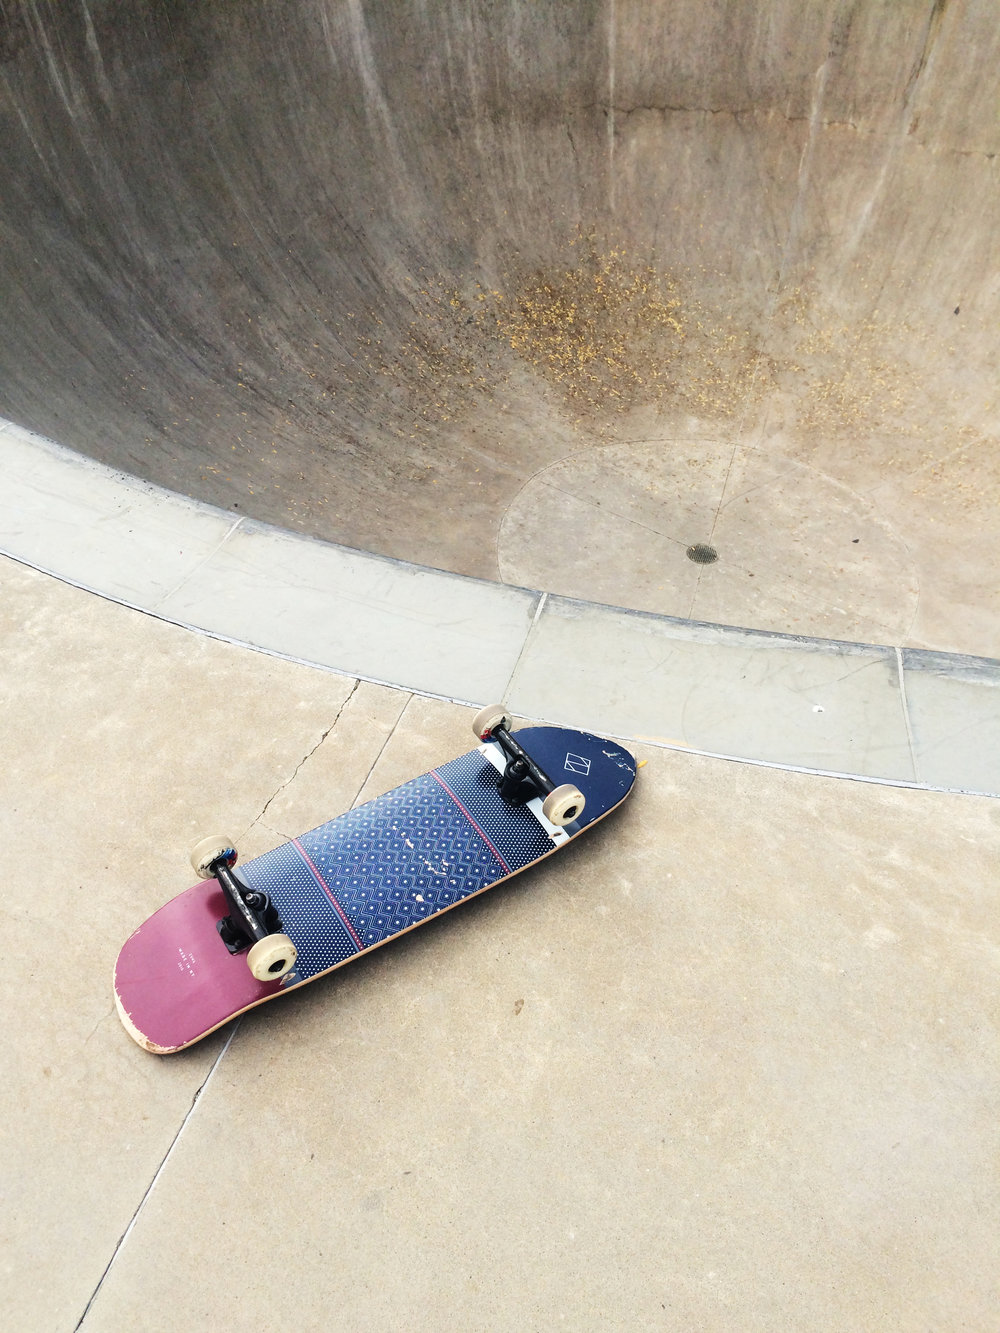 Zung Skate